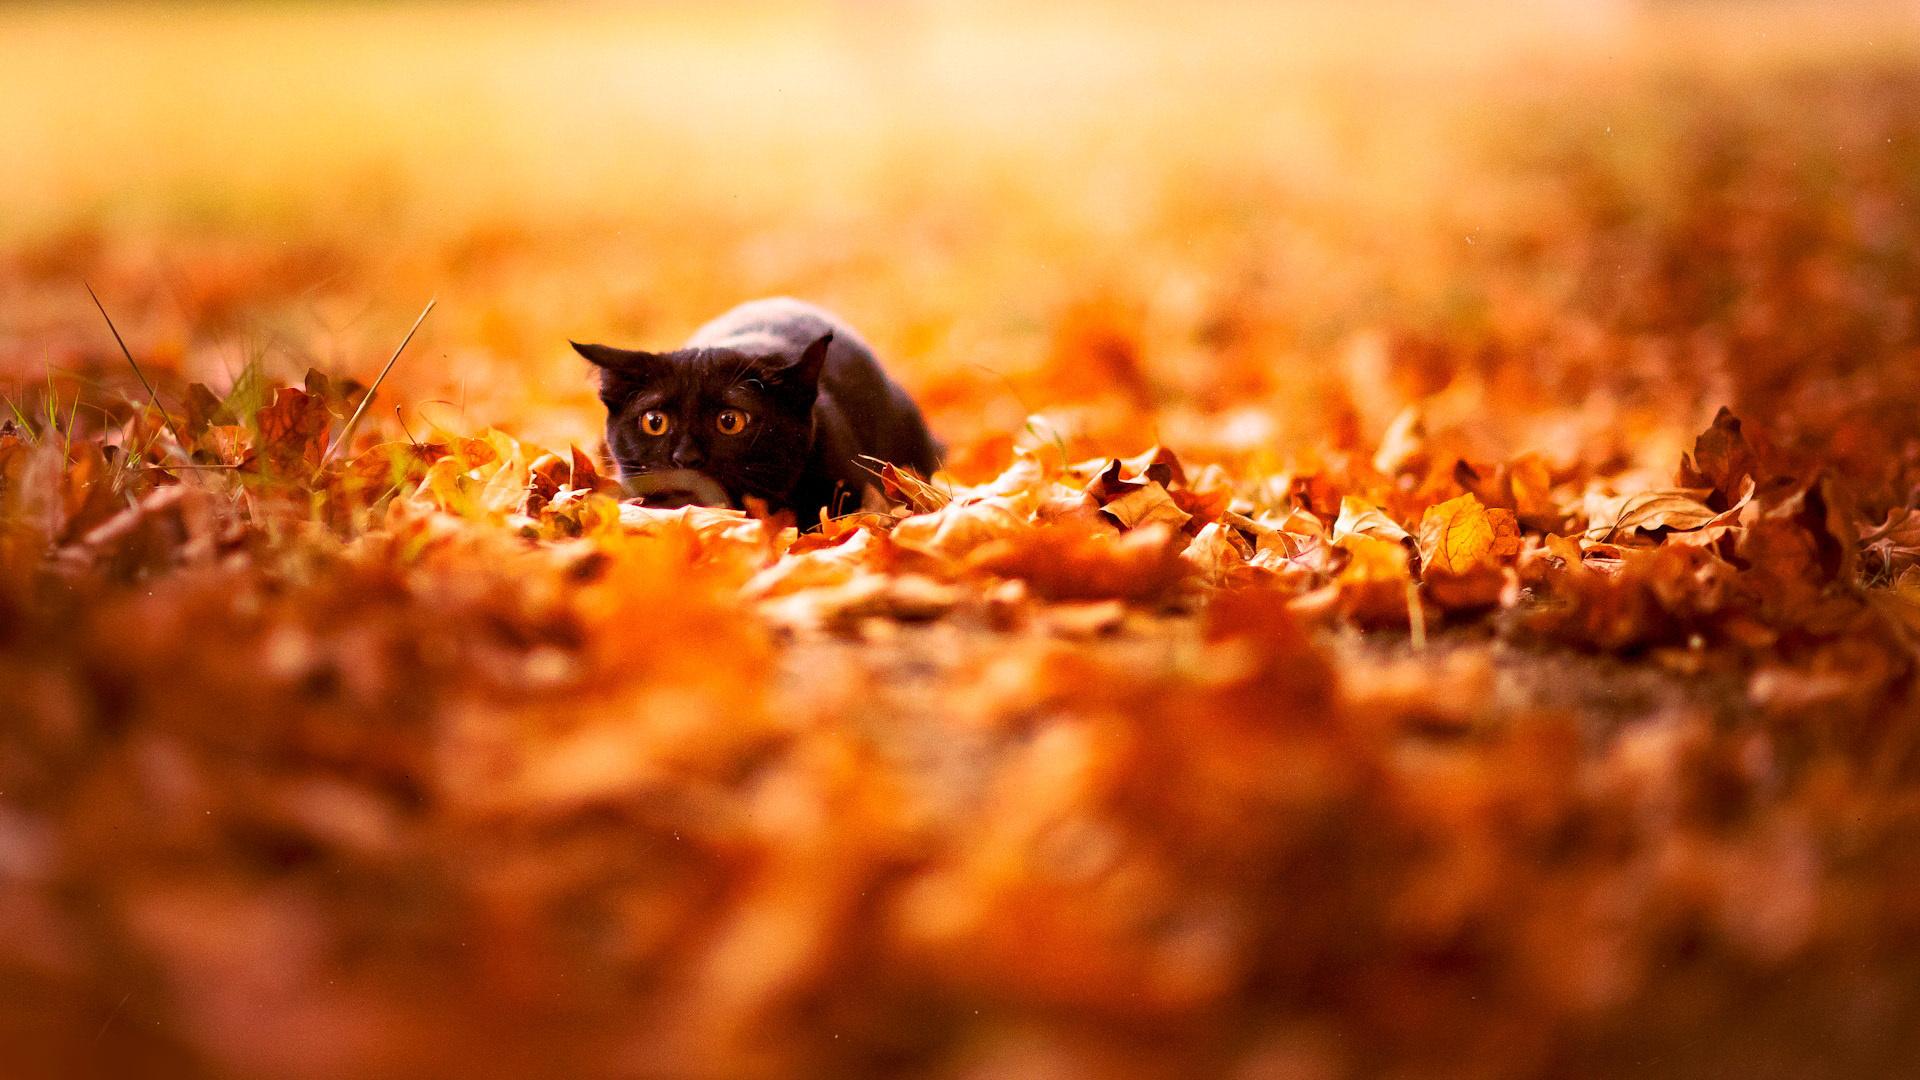 Fall Desktop Wallpaper Hd Autumn leaves 1920x1080